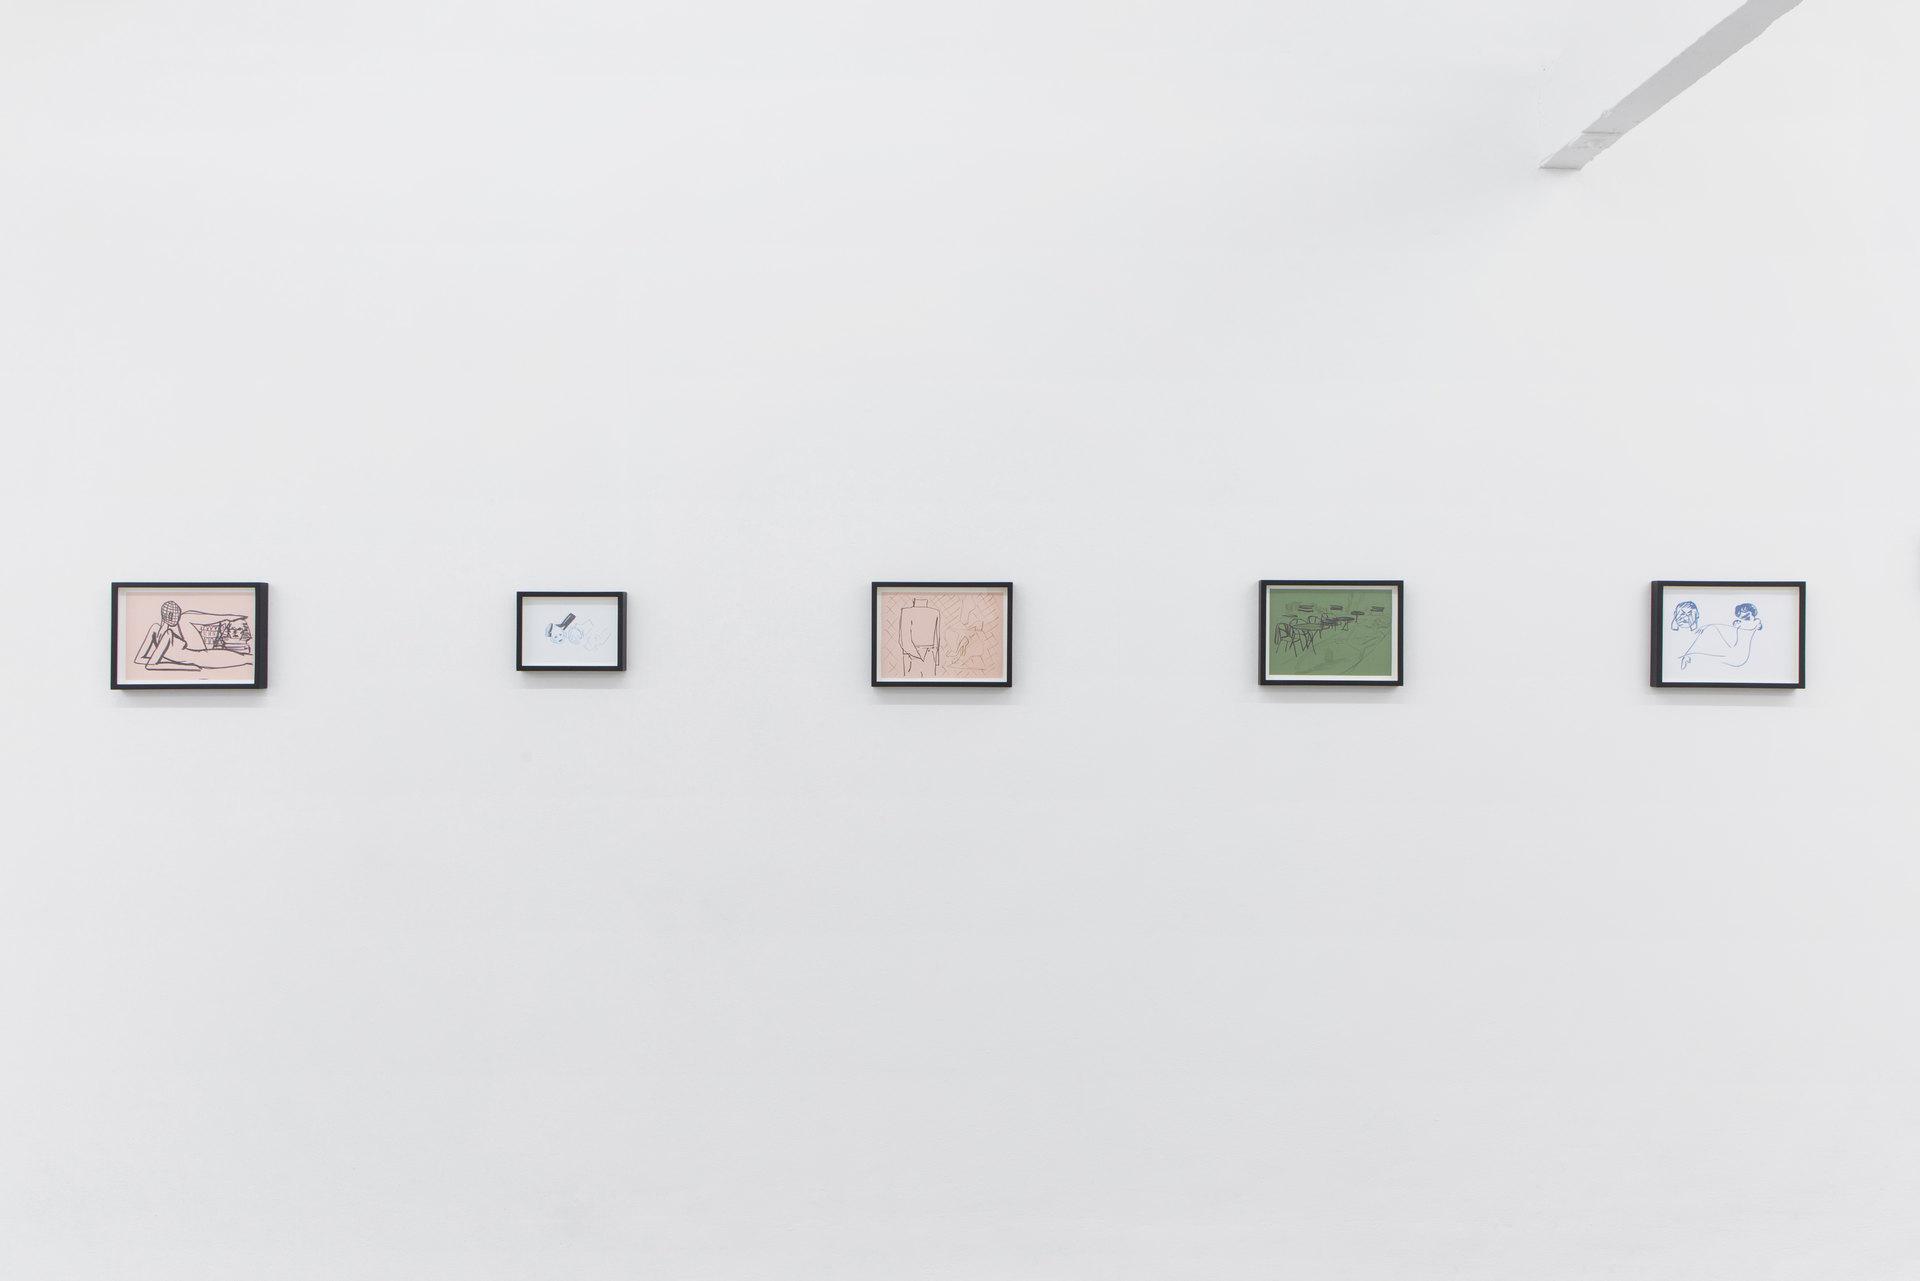 Zuzanna Bartoszek, 2017, Installation View, Perverts, Cell Project Space